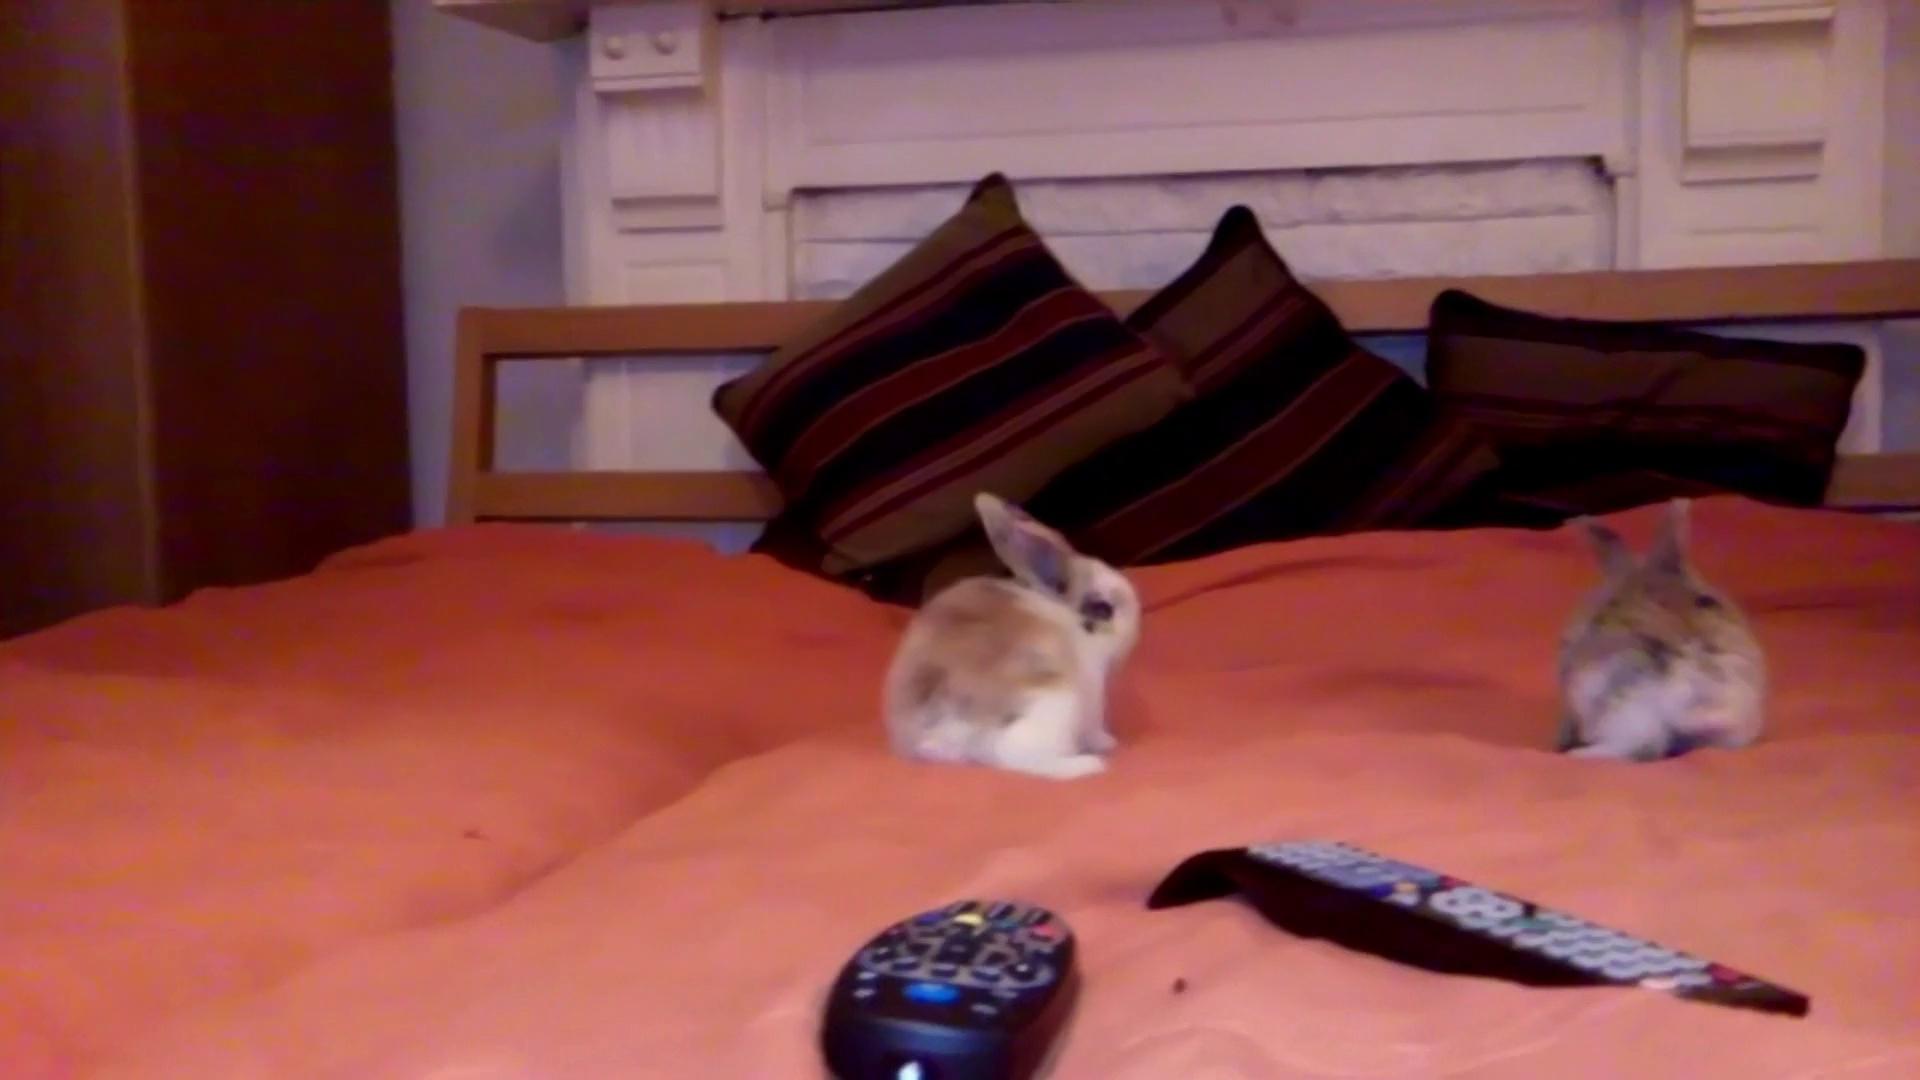 Cute Dwarf Rabbits Hop Around on Bed